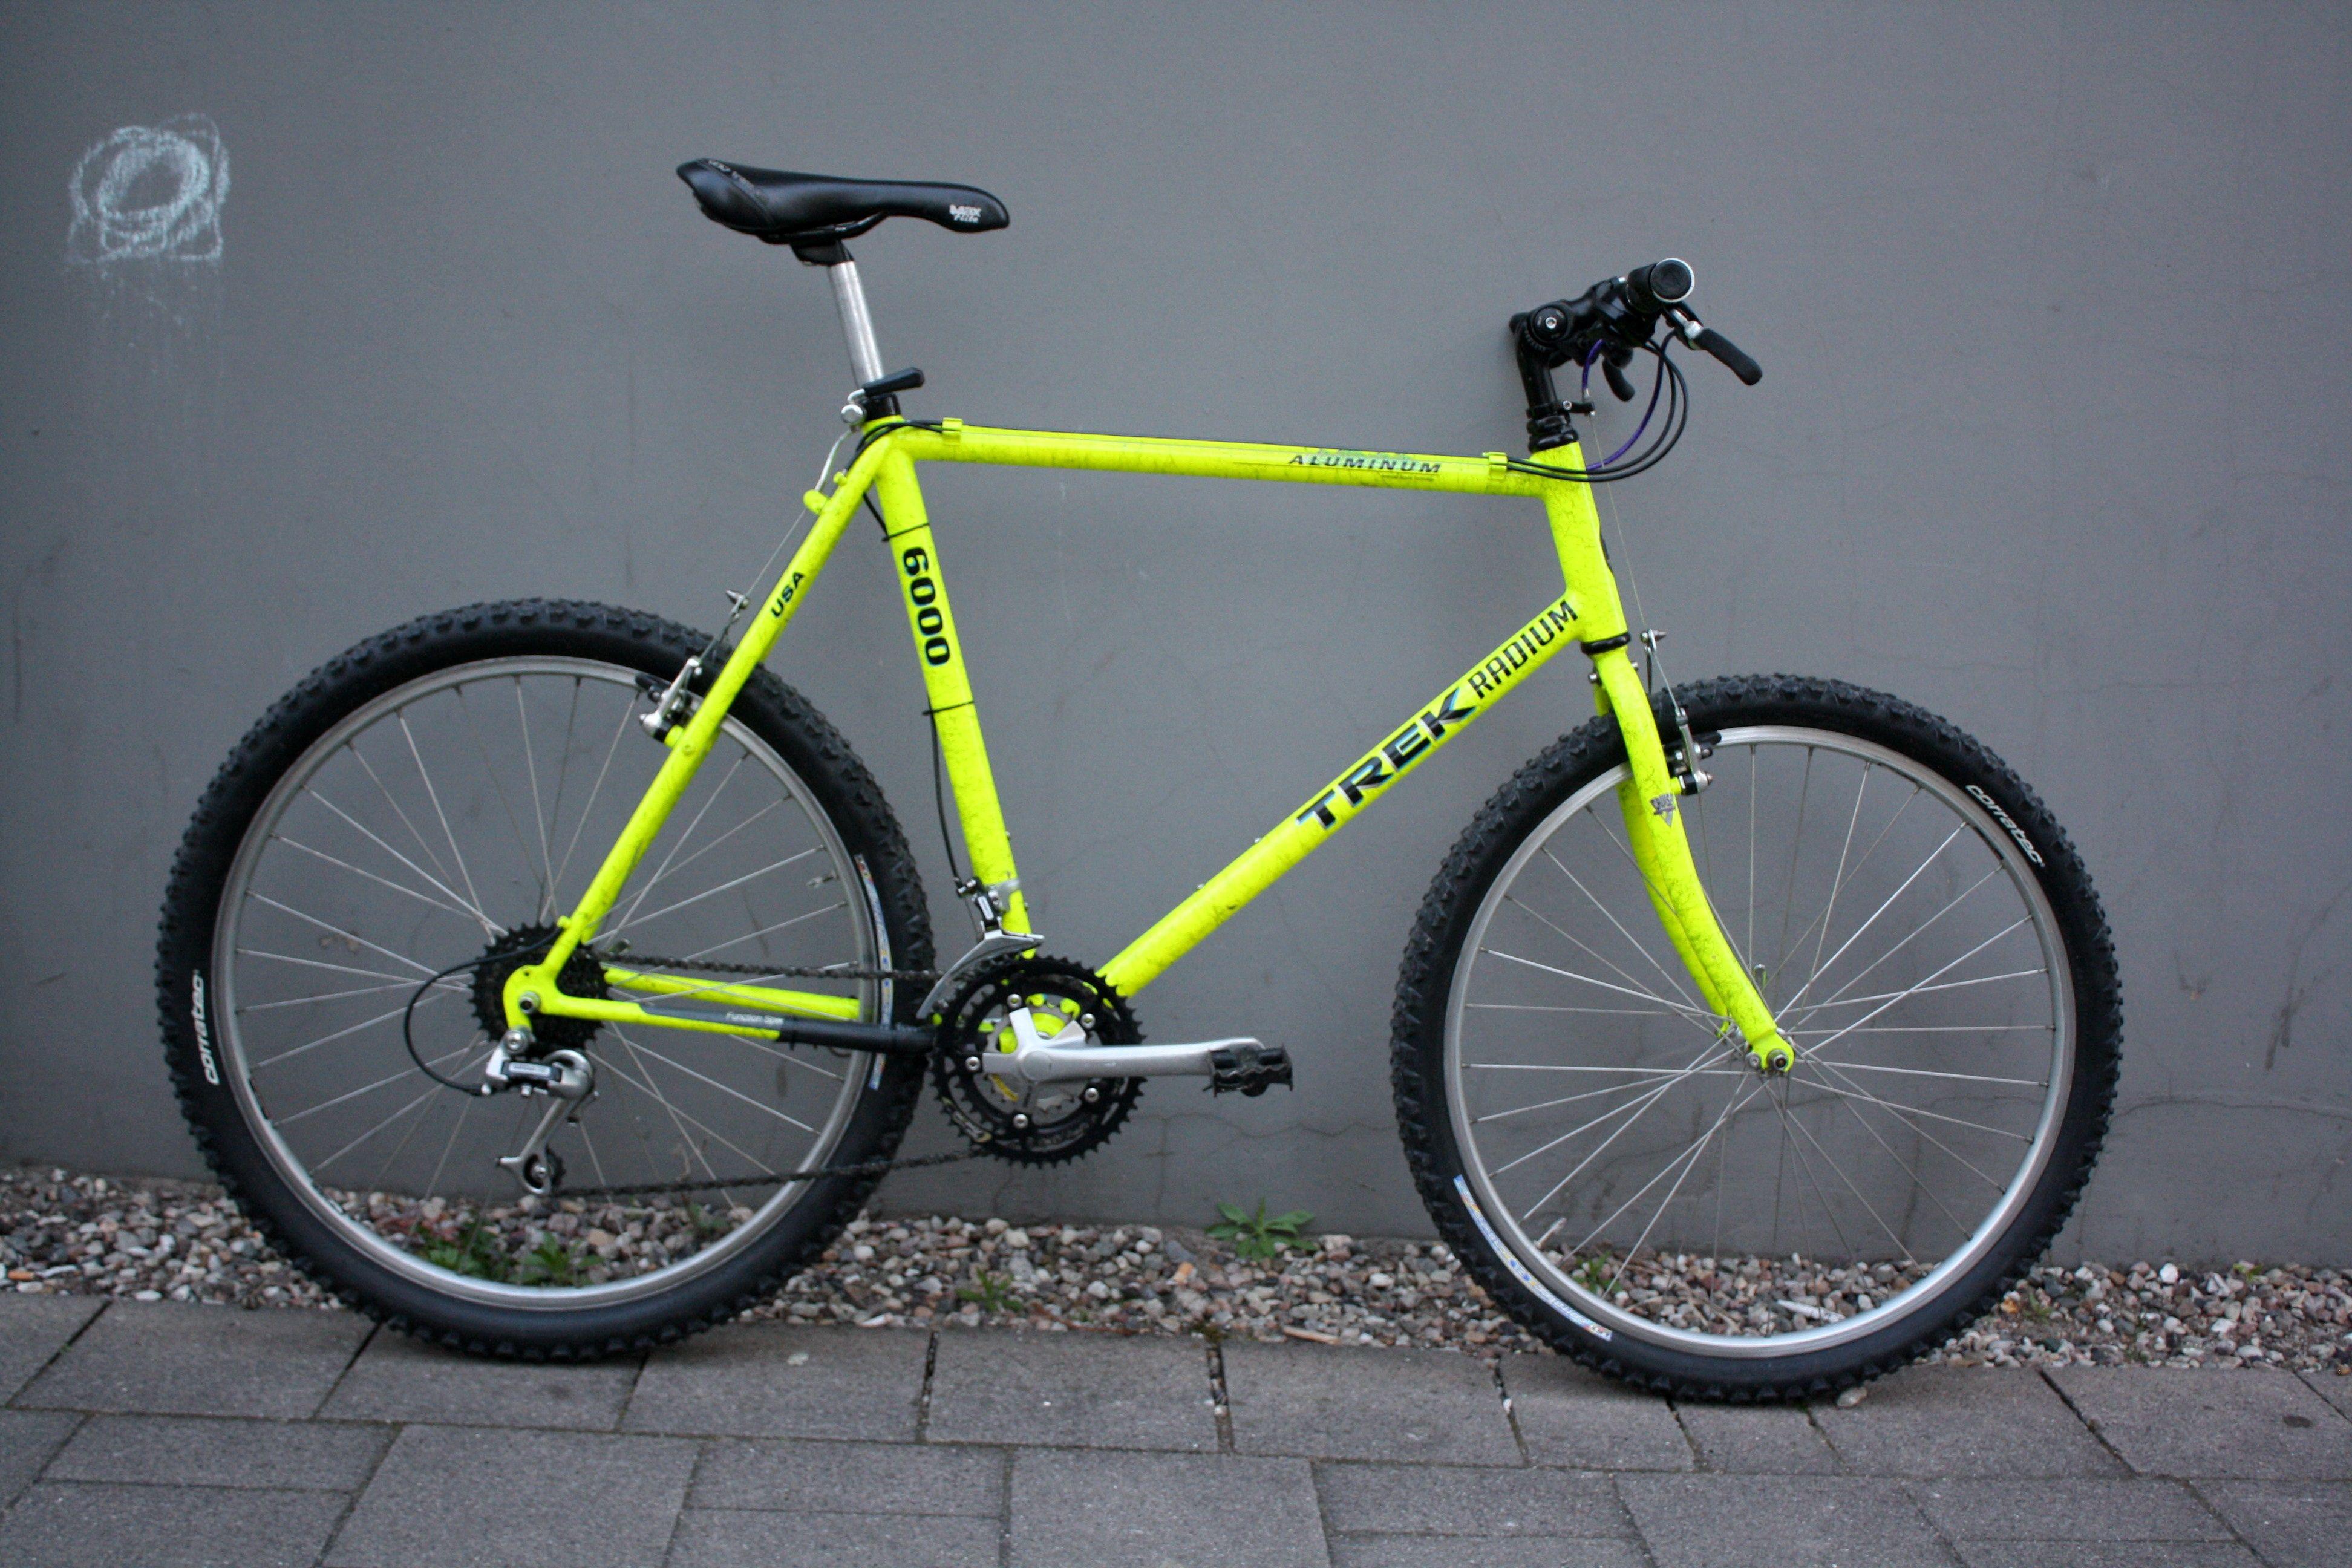 Trek 6000 classic mtb | RETRO MTB 121 | Trek bikes, Gt bikes, Bicycle